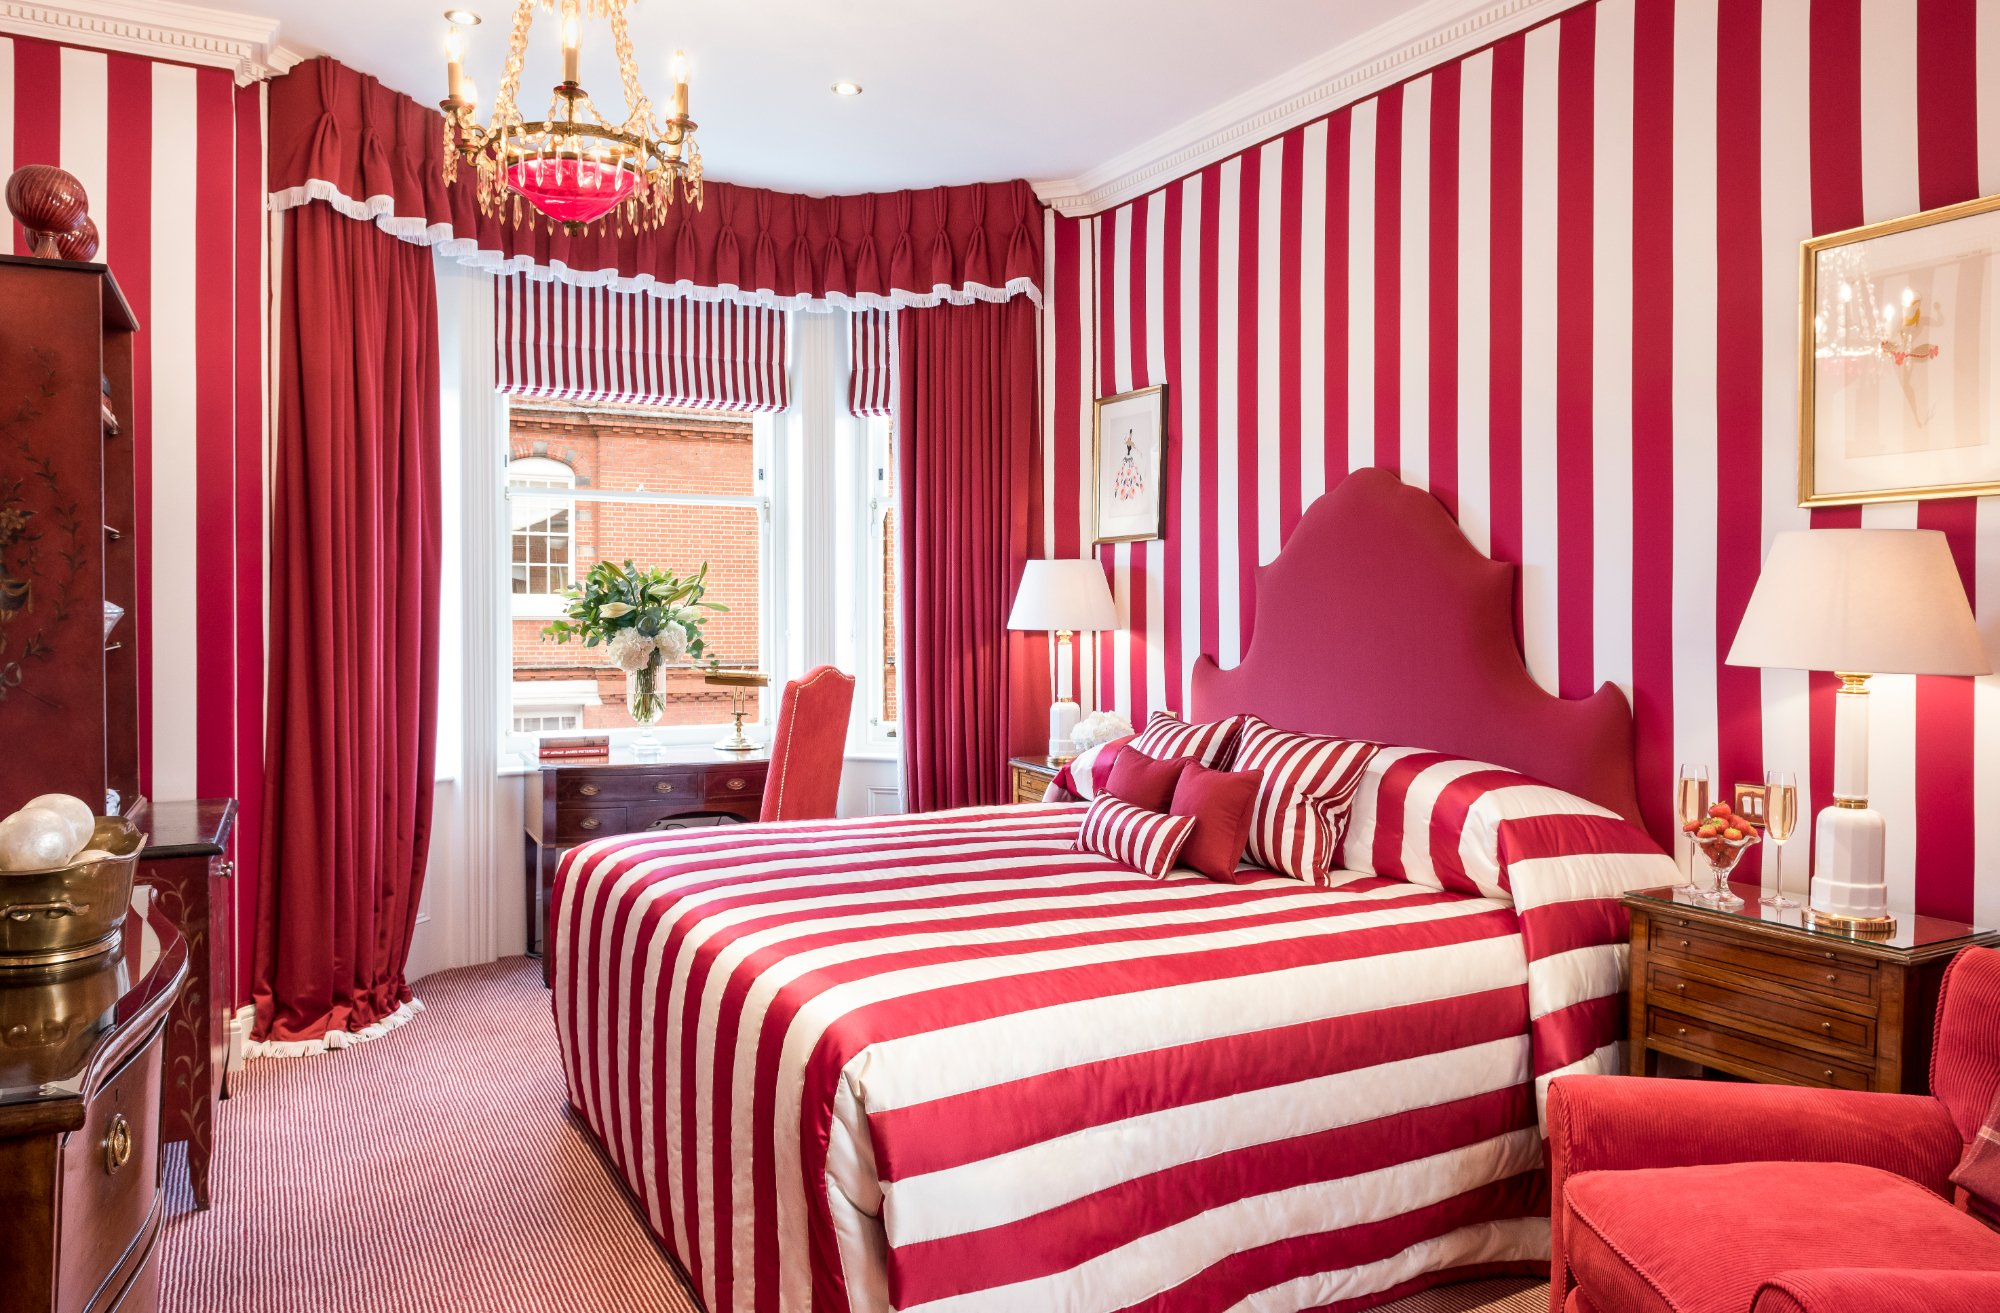 Egerton House Hotel Tripadvisor